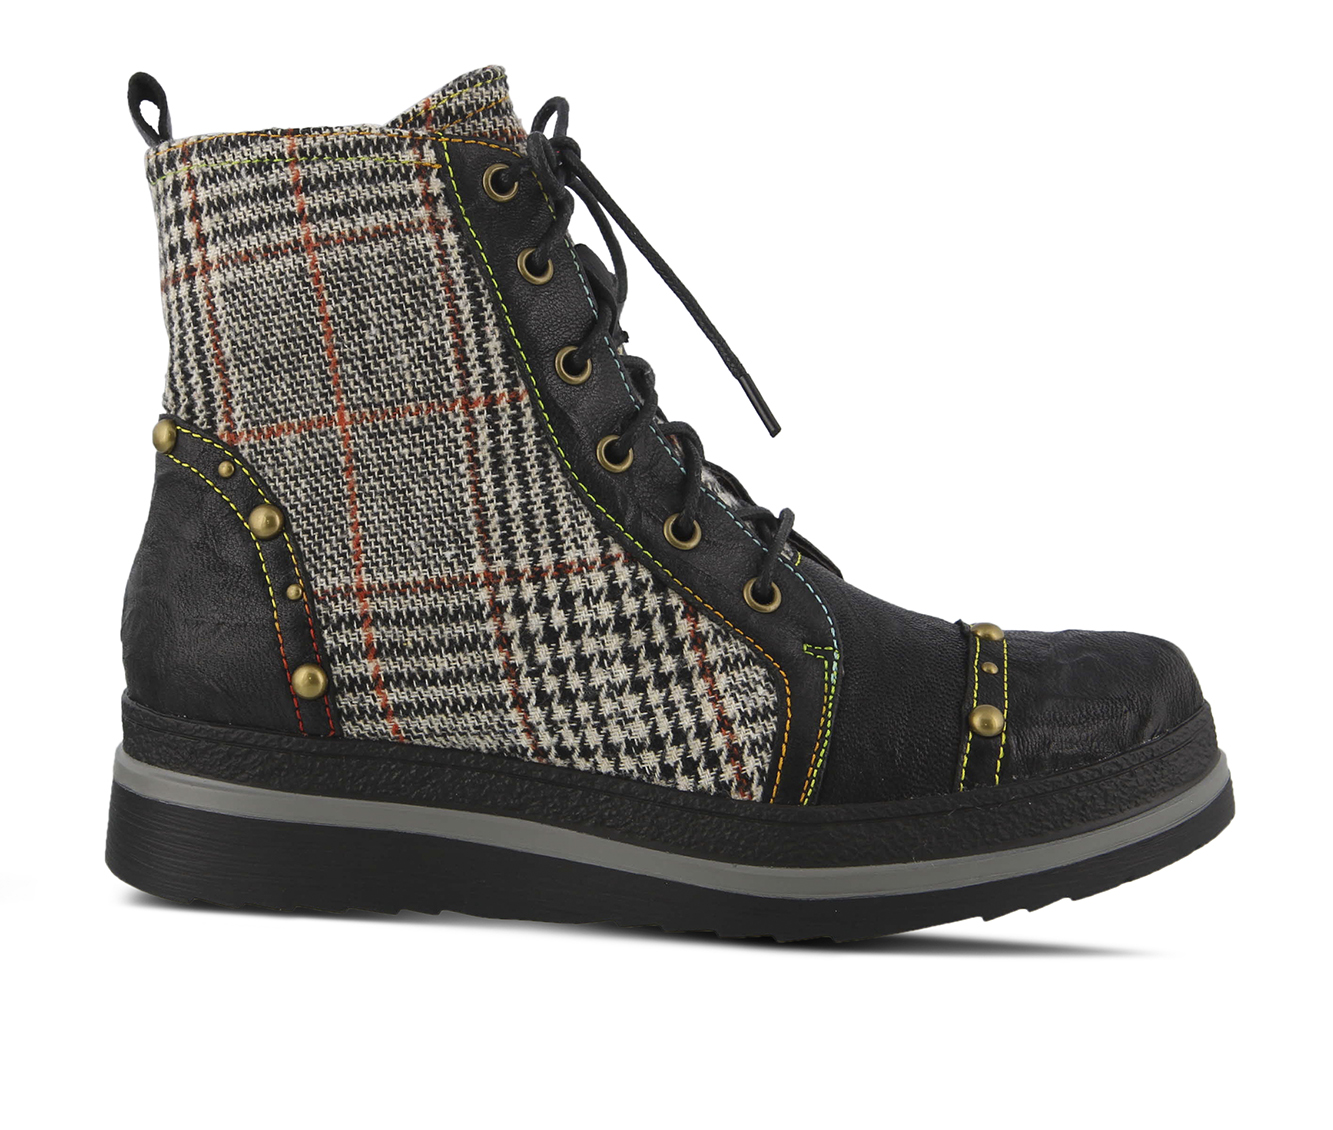 L'Artiste Rehja Women's Boots (Black Leather)